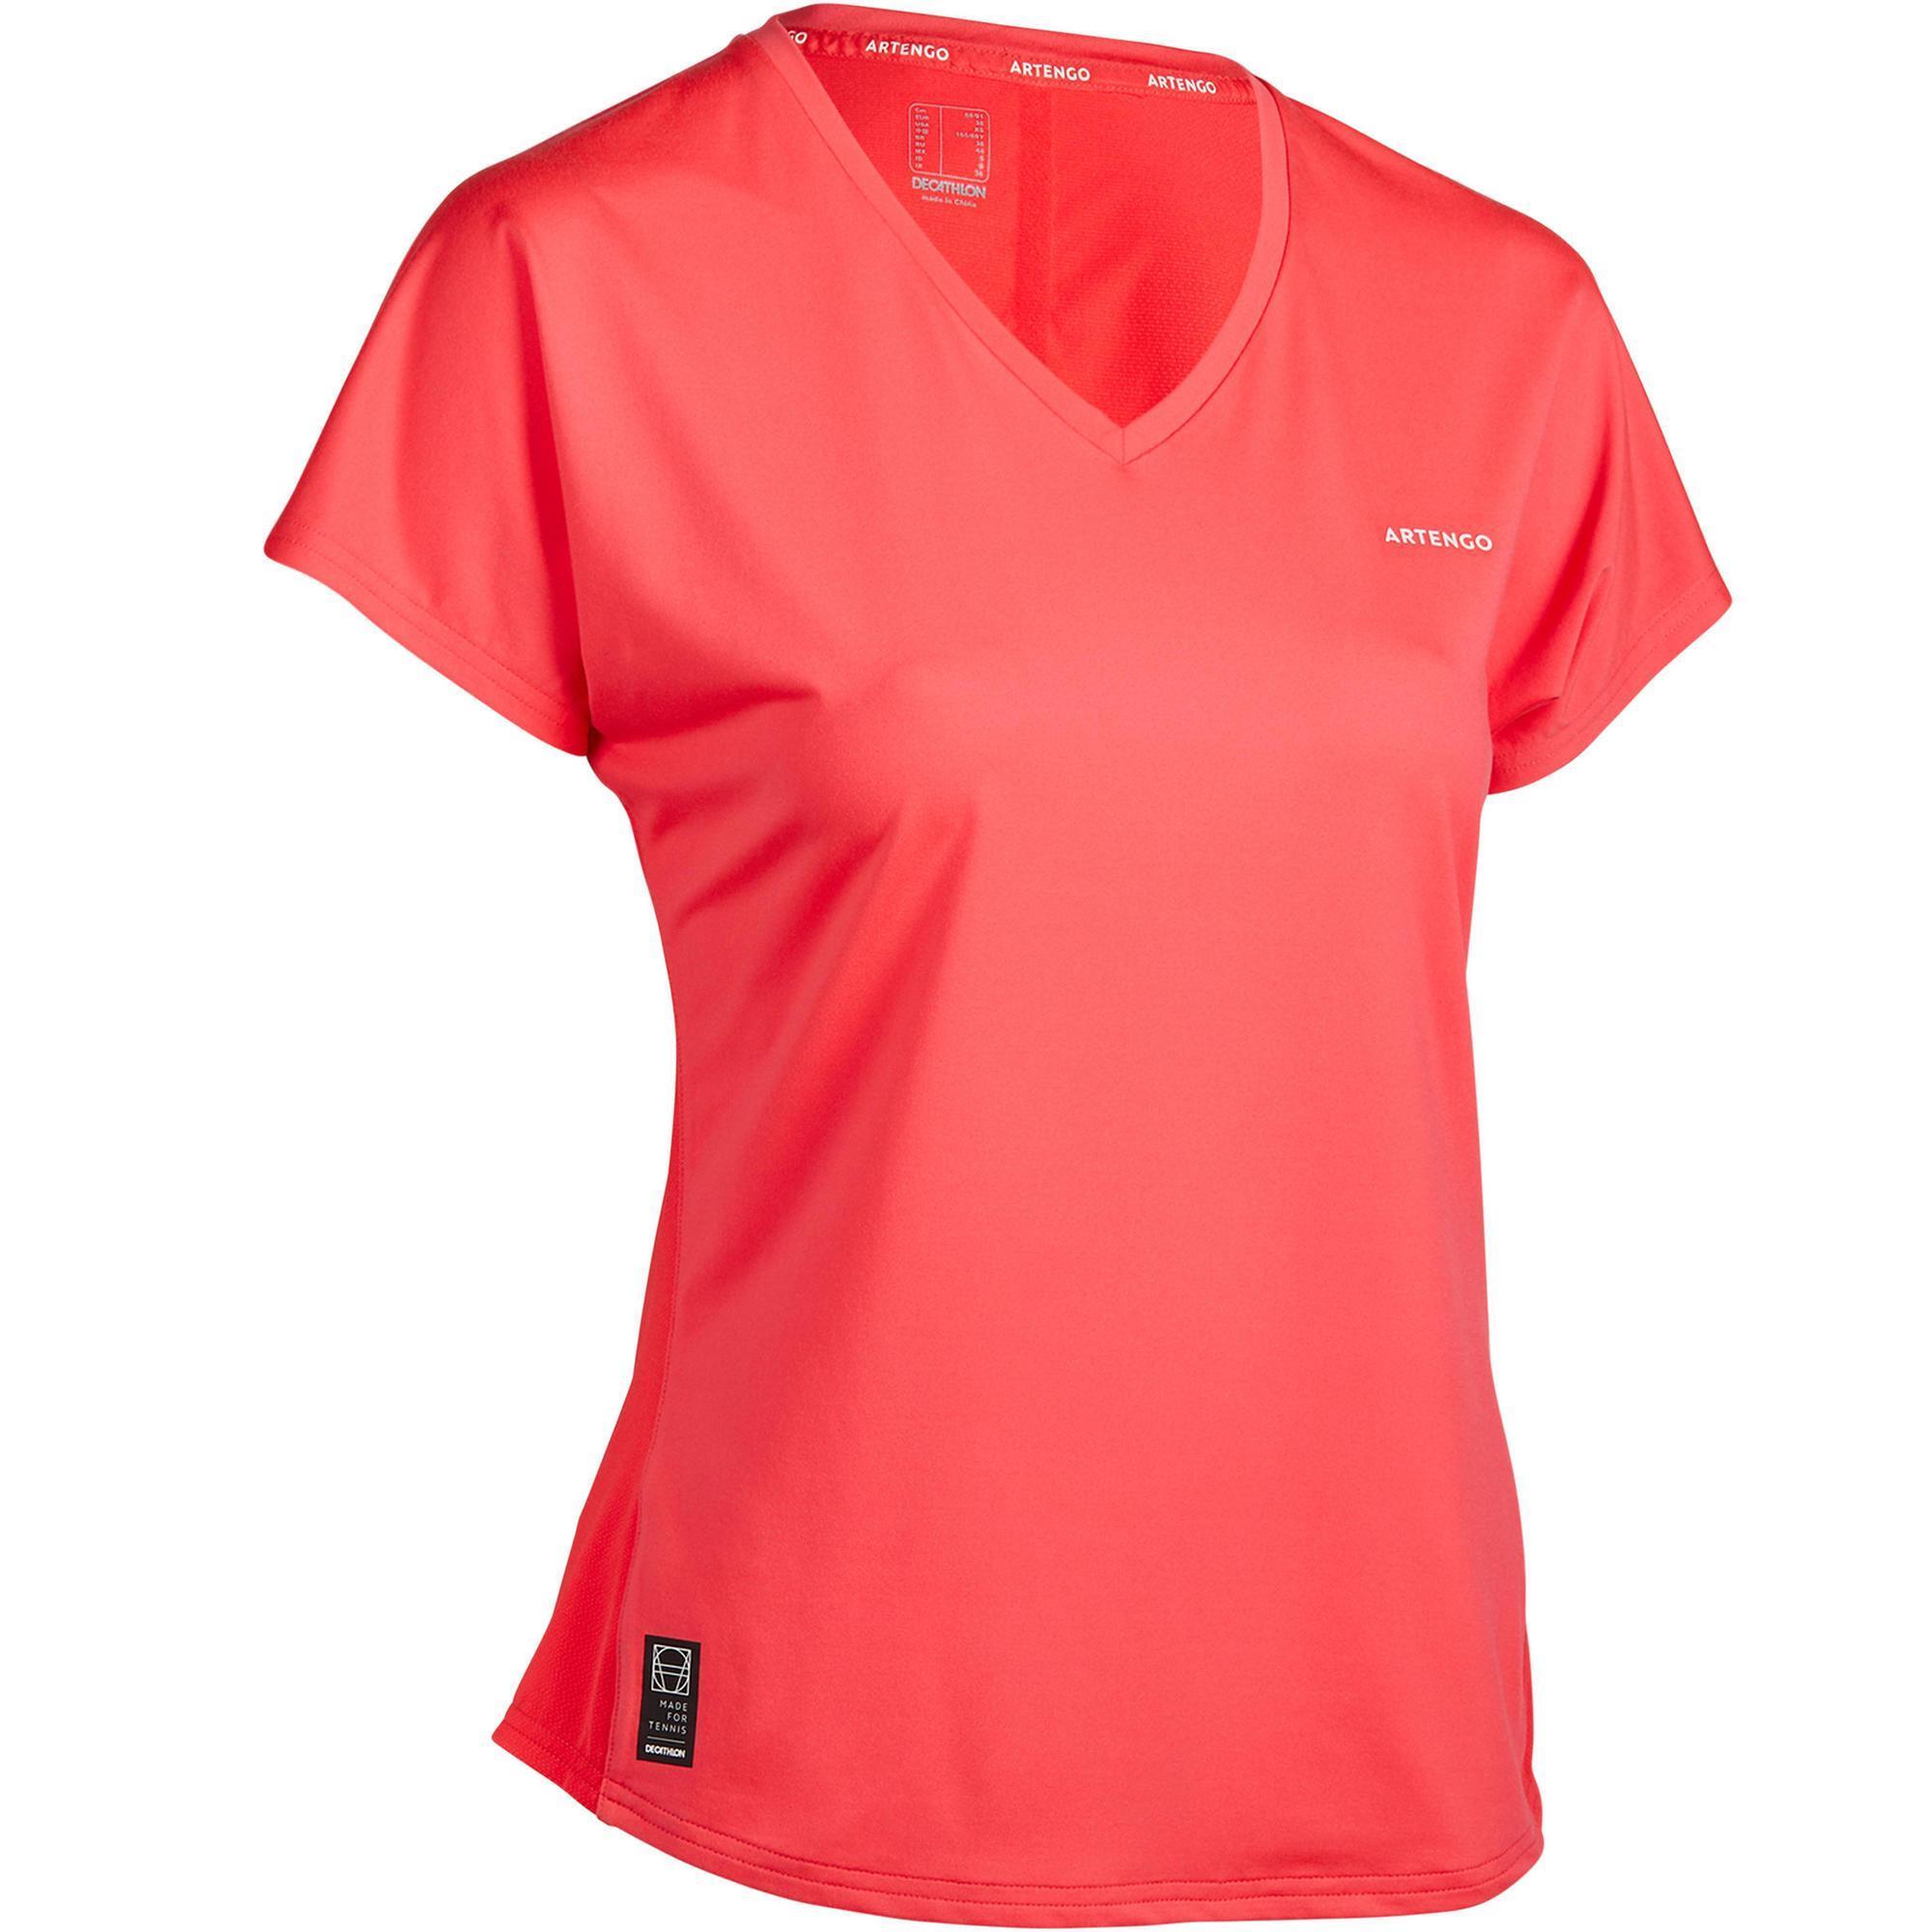 Tennis T-Shirt TS Soft 500 Damen rosa | Sportbekleidung > Sportshirts > Tennisshirts | Rosa | Baumwolle | Artengo